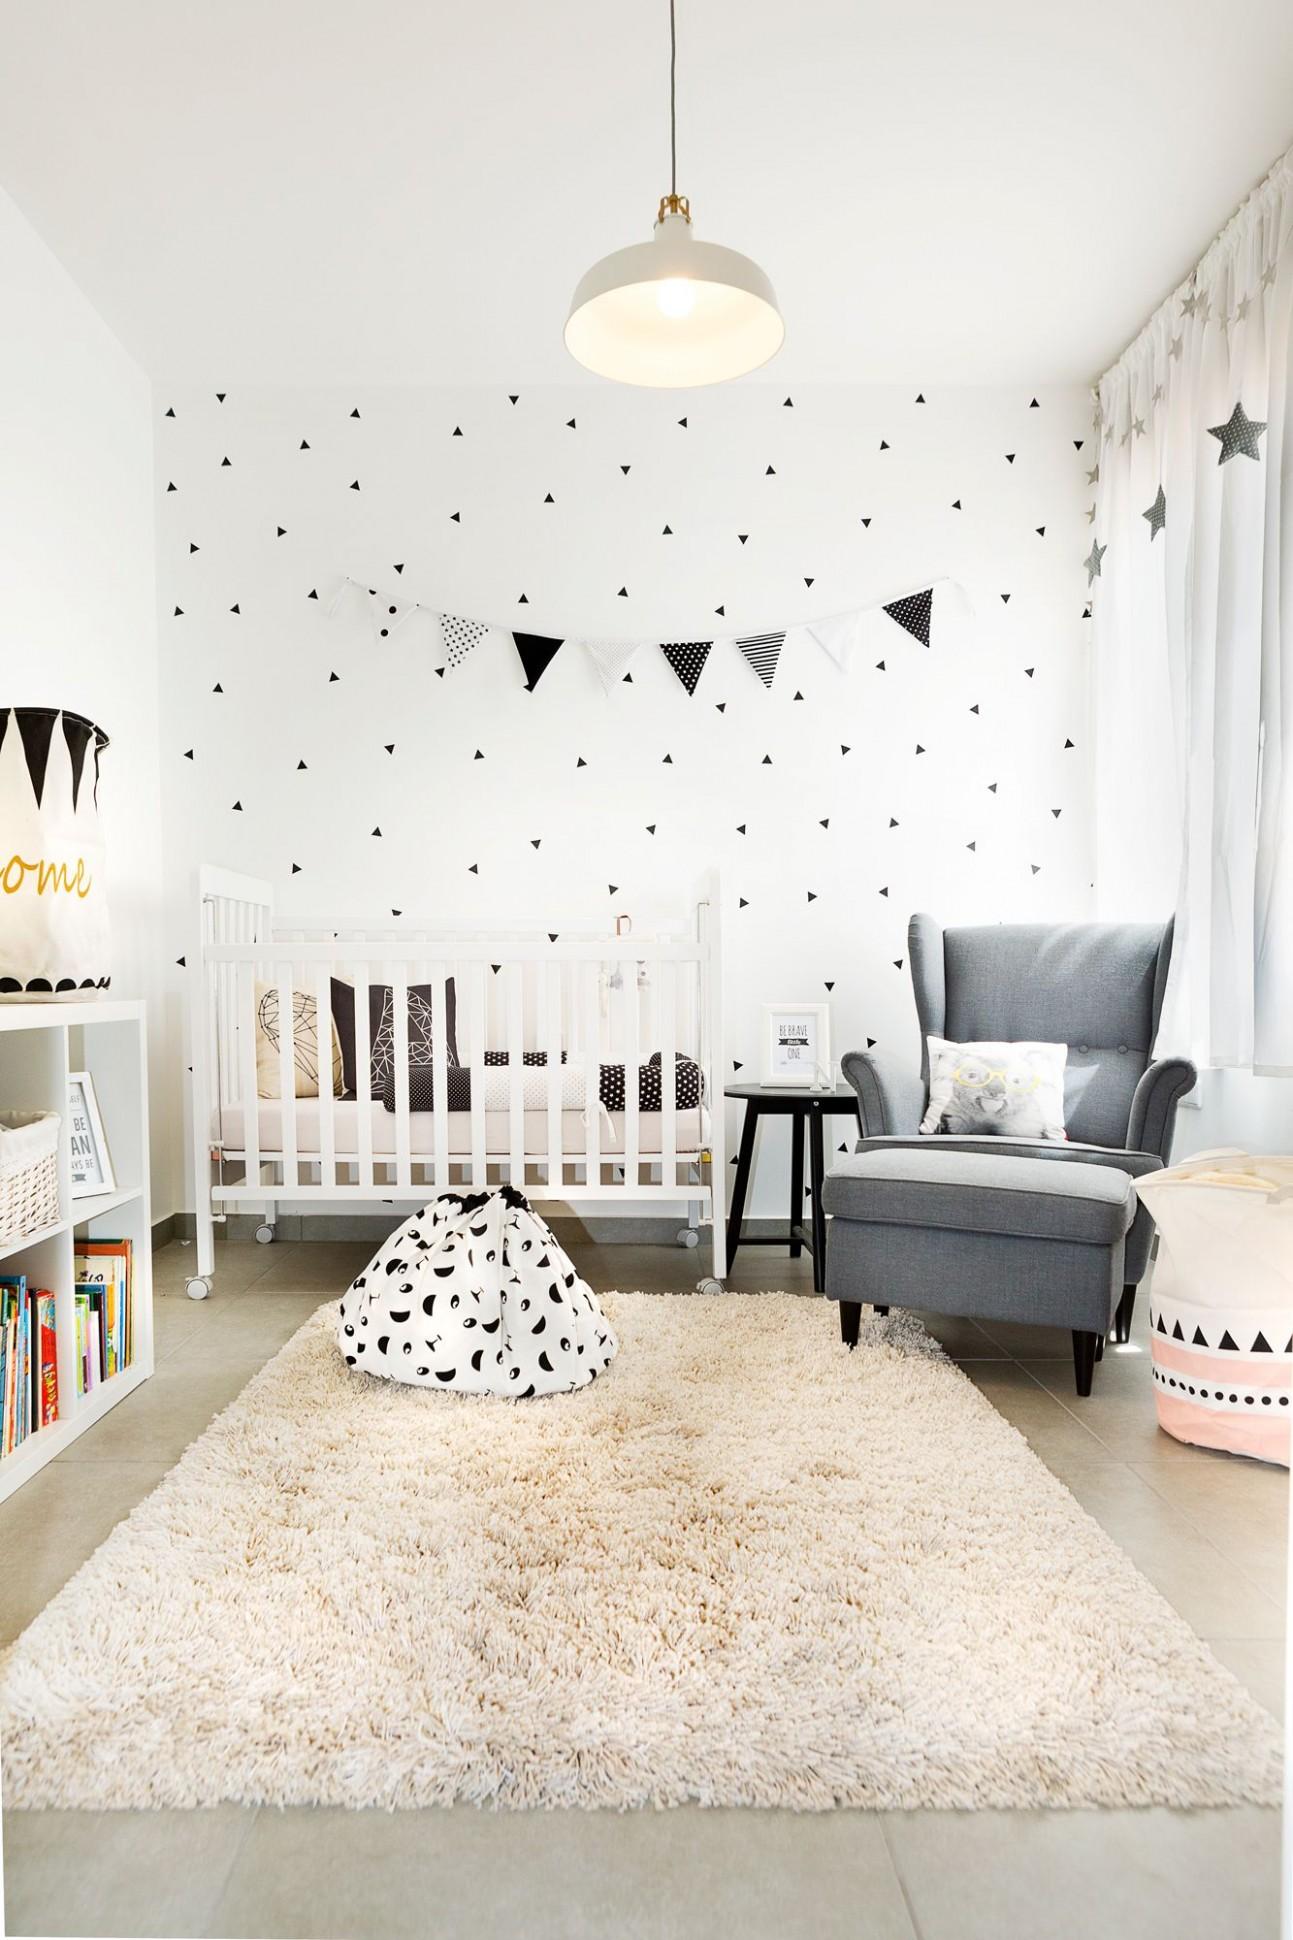 black and white geometric design baby room ikea style by dana  - Baby Room Ikea